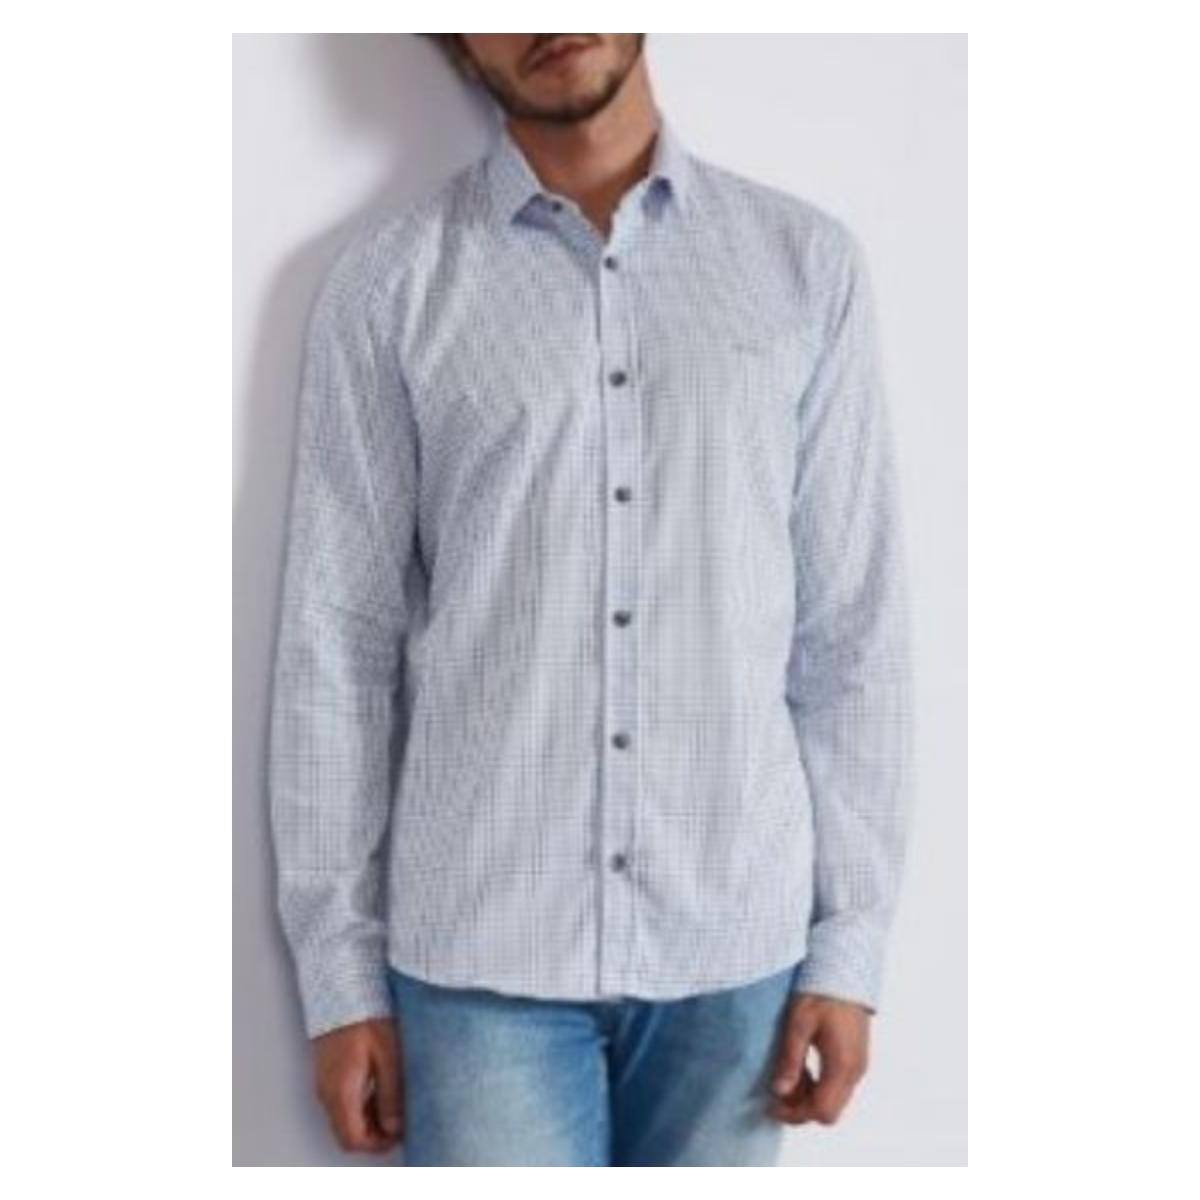 Camisa Masculina Colcci 310103793 Vc74 Xadrez Azul